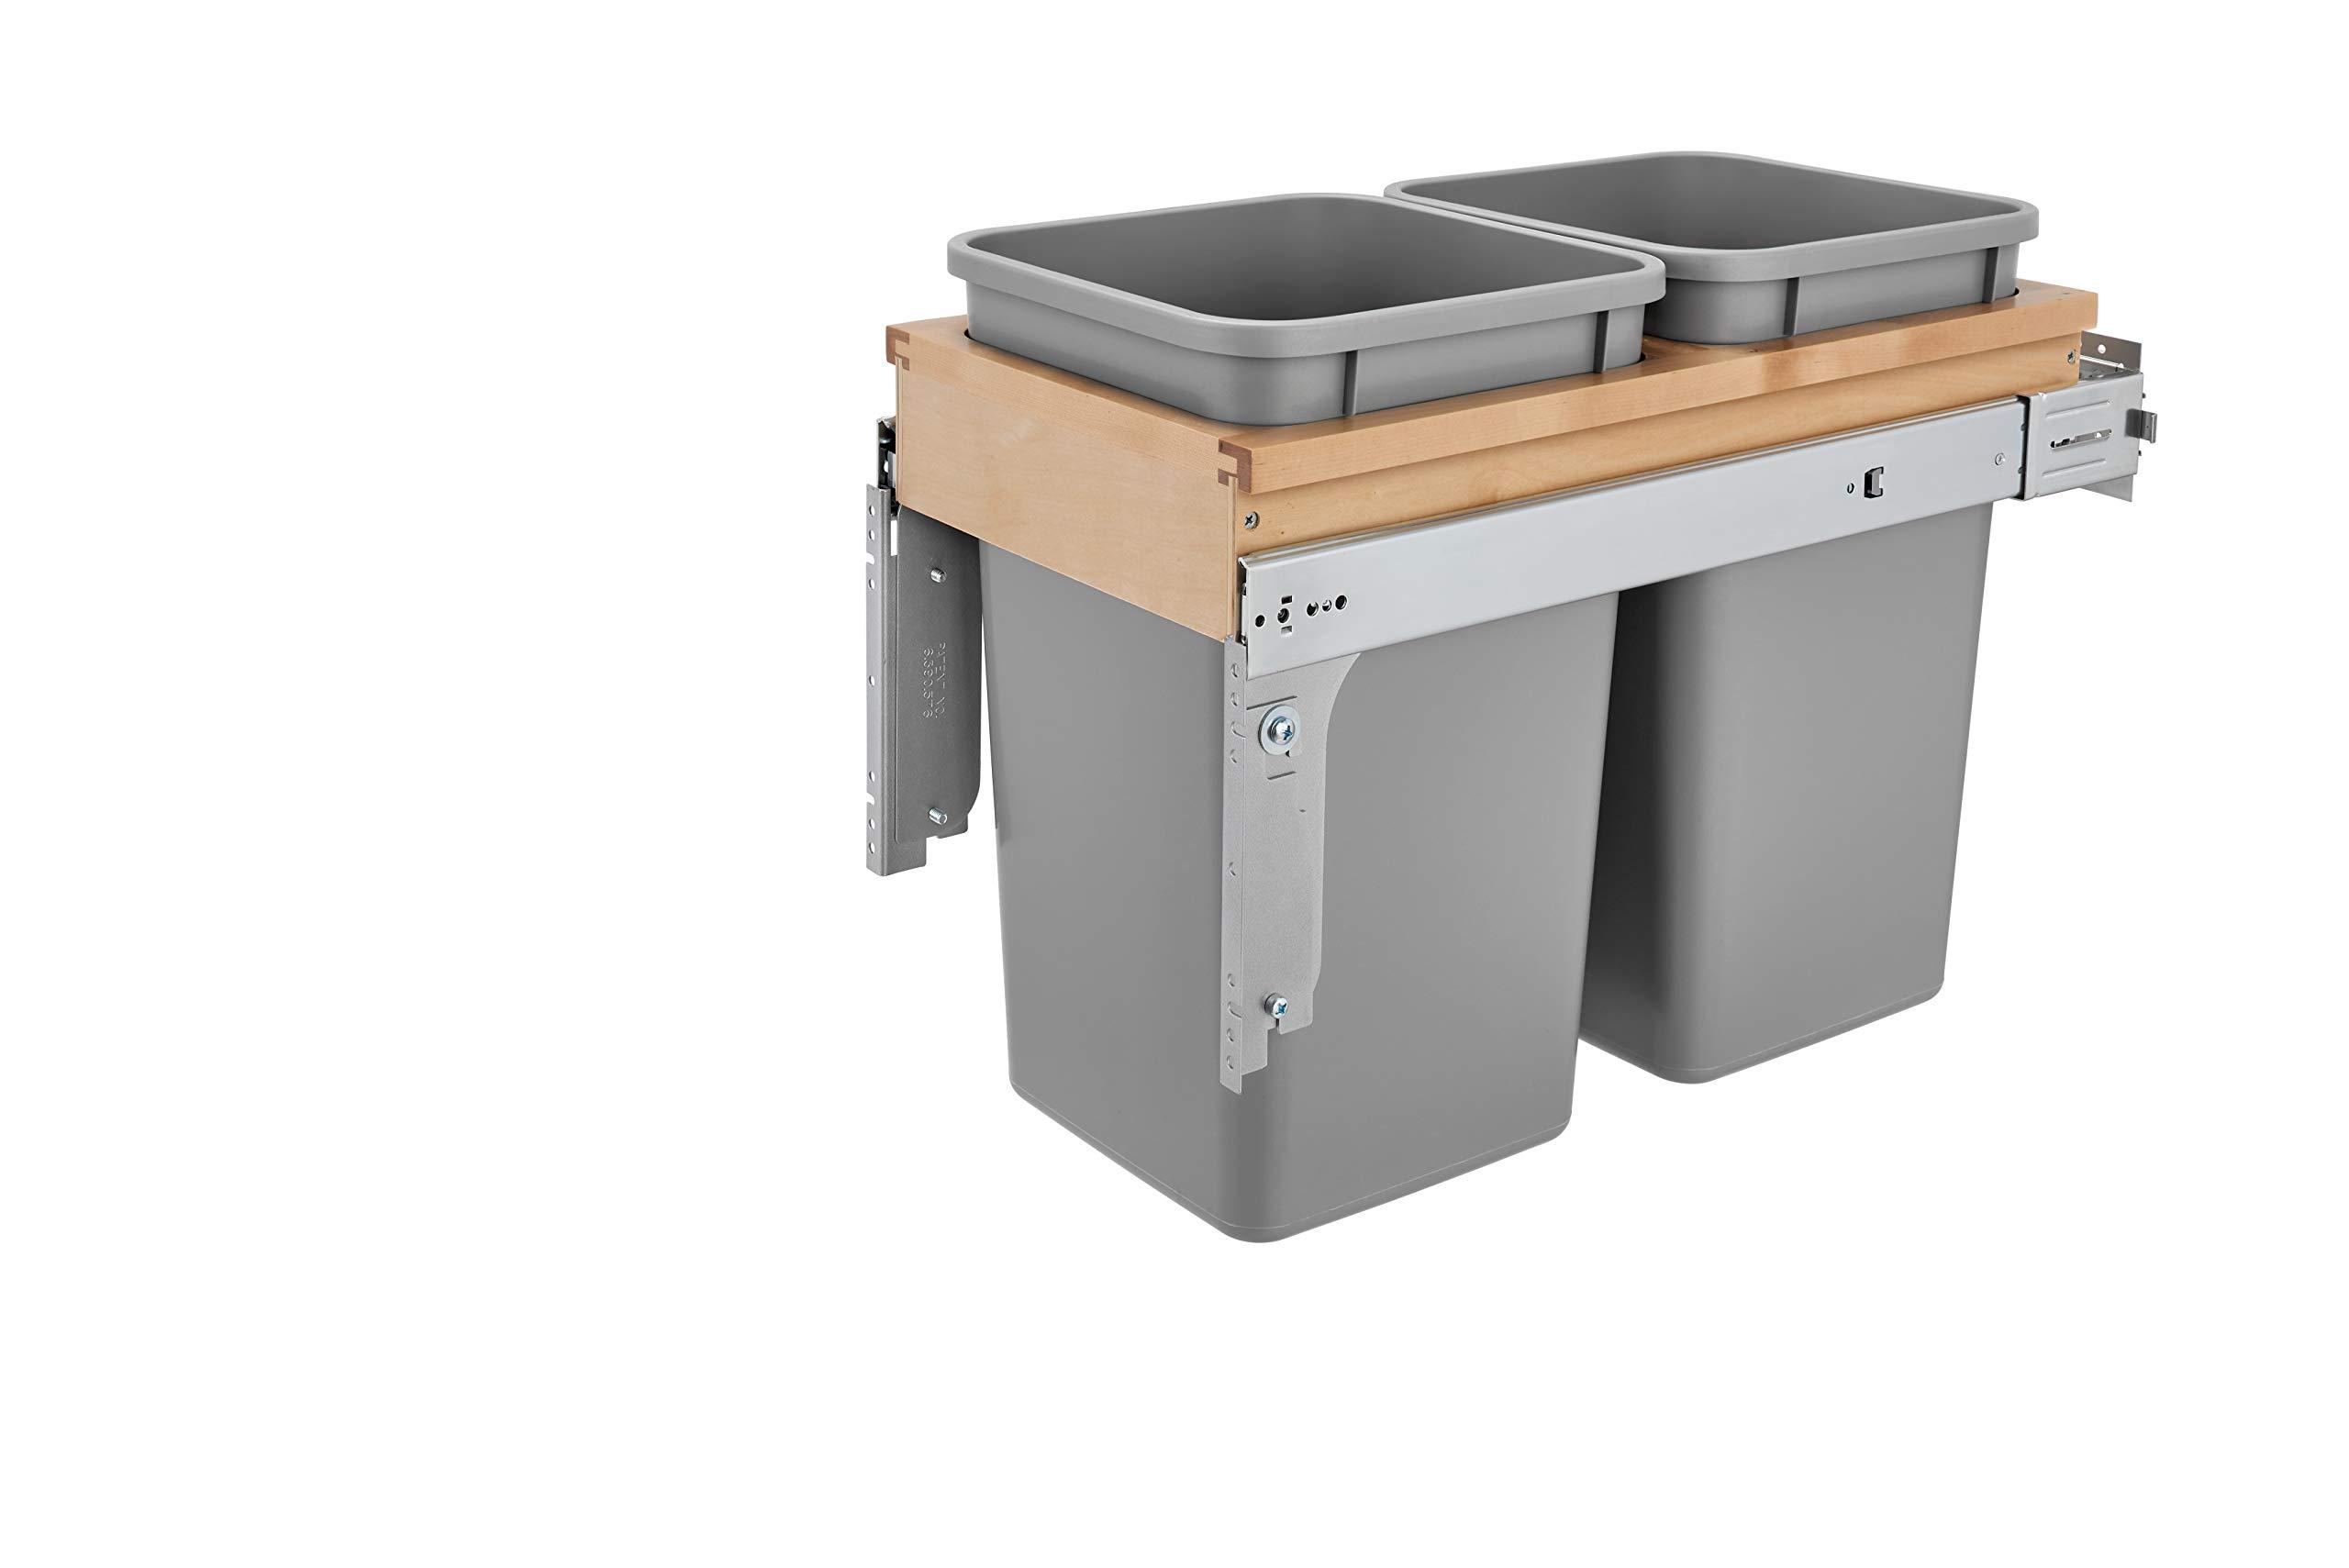 Rev-A-Shelf Dbl 27 QT Top Mount Waste Container, Quart, Natural